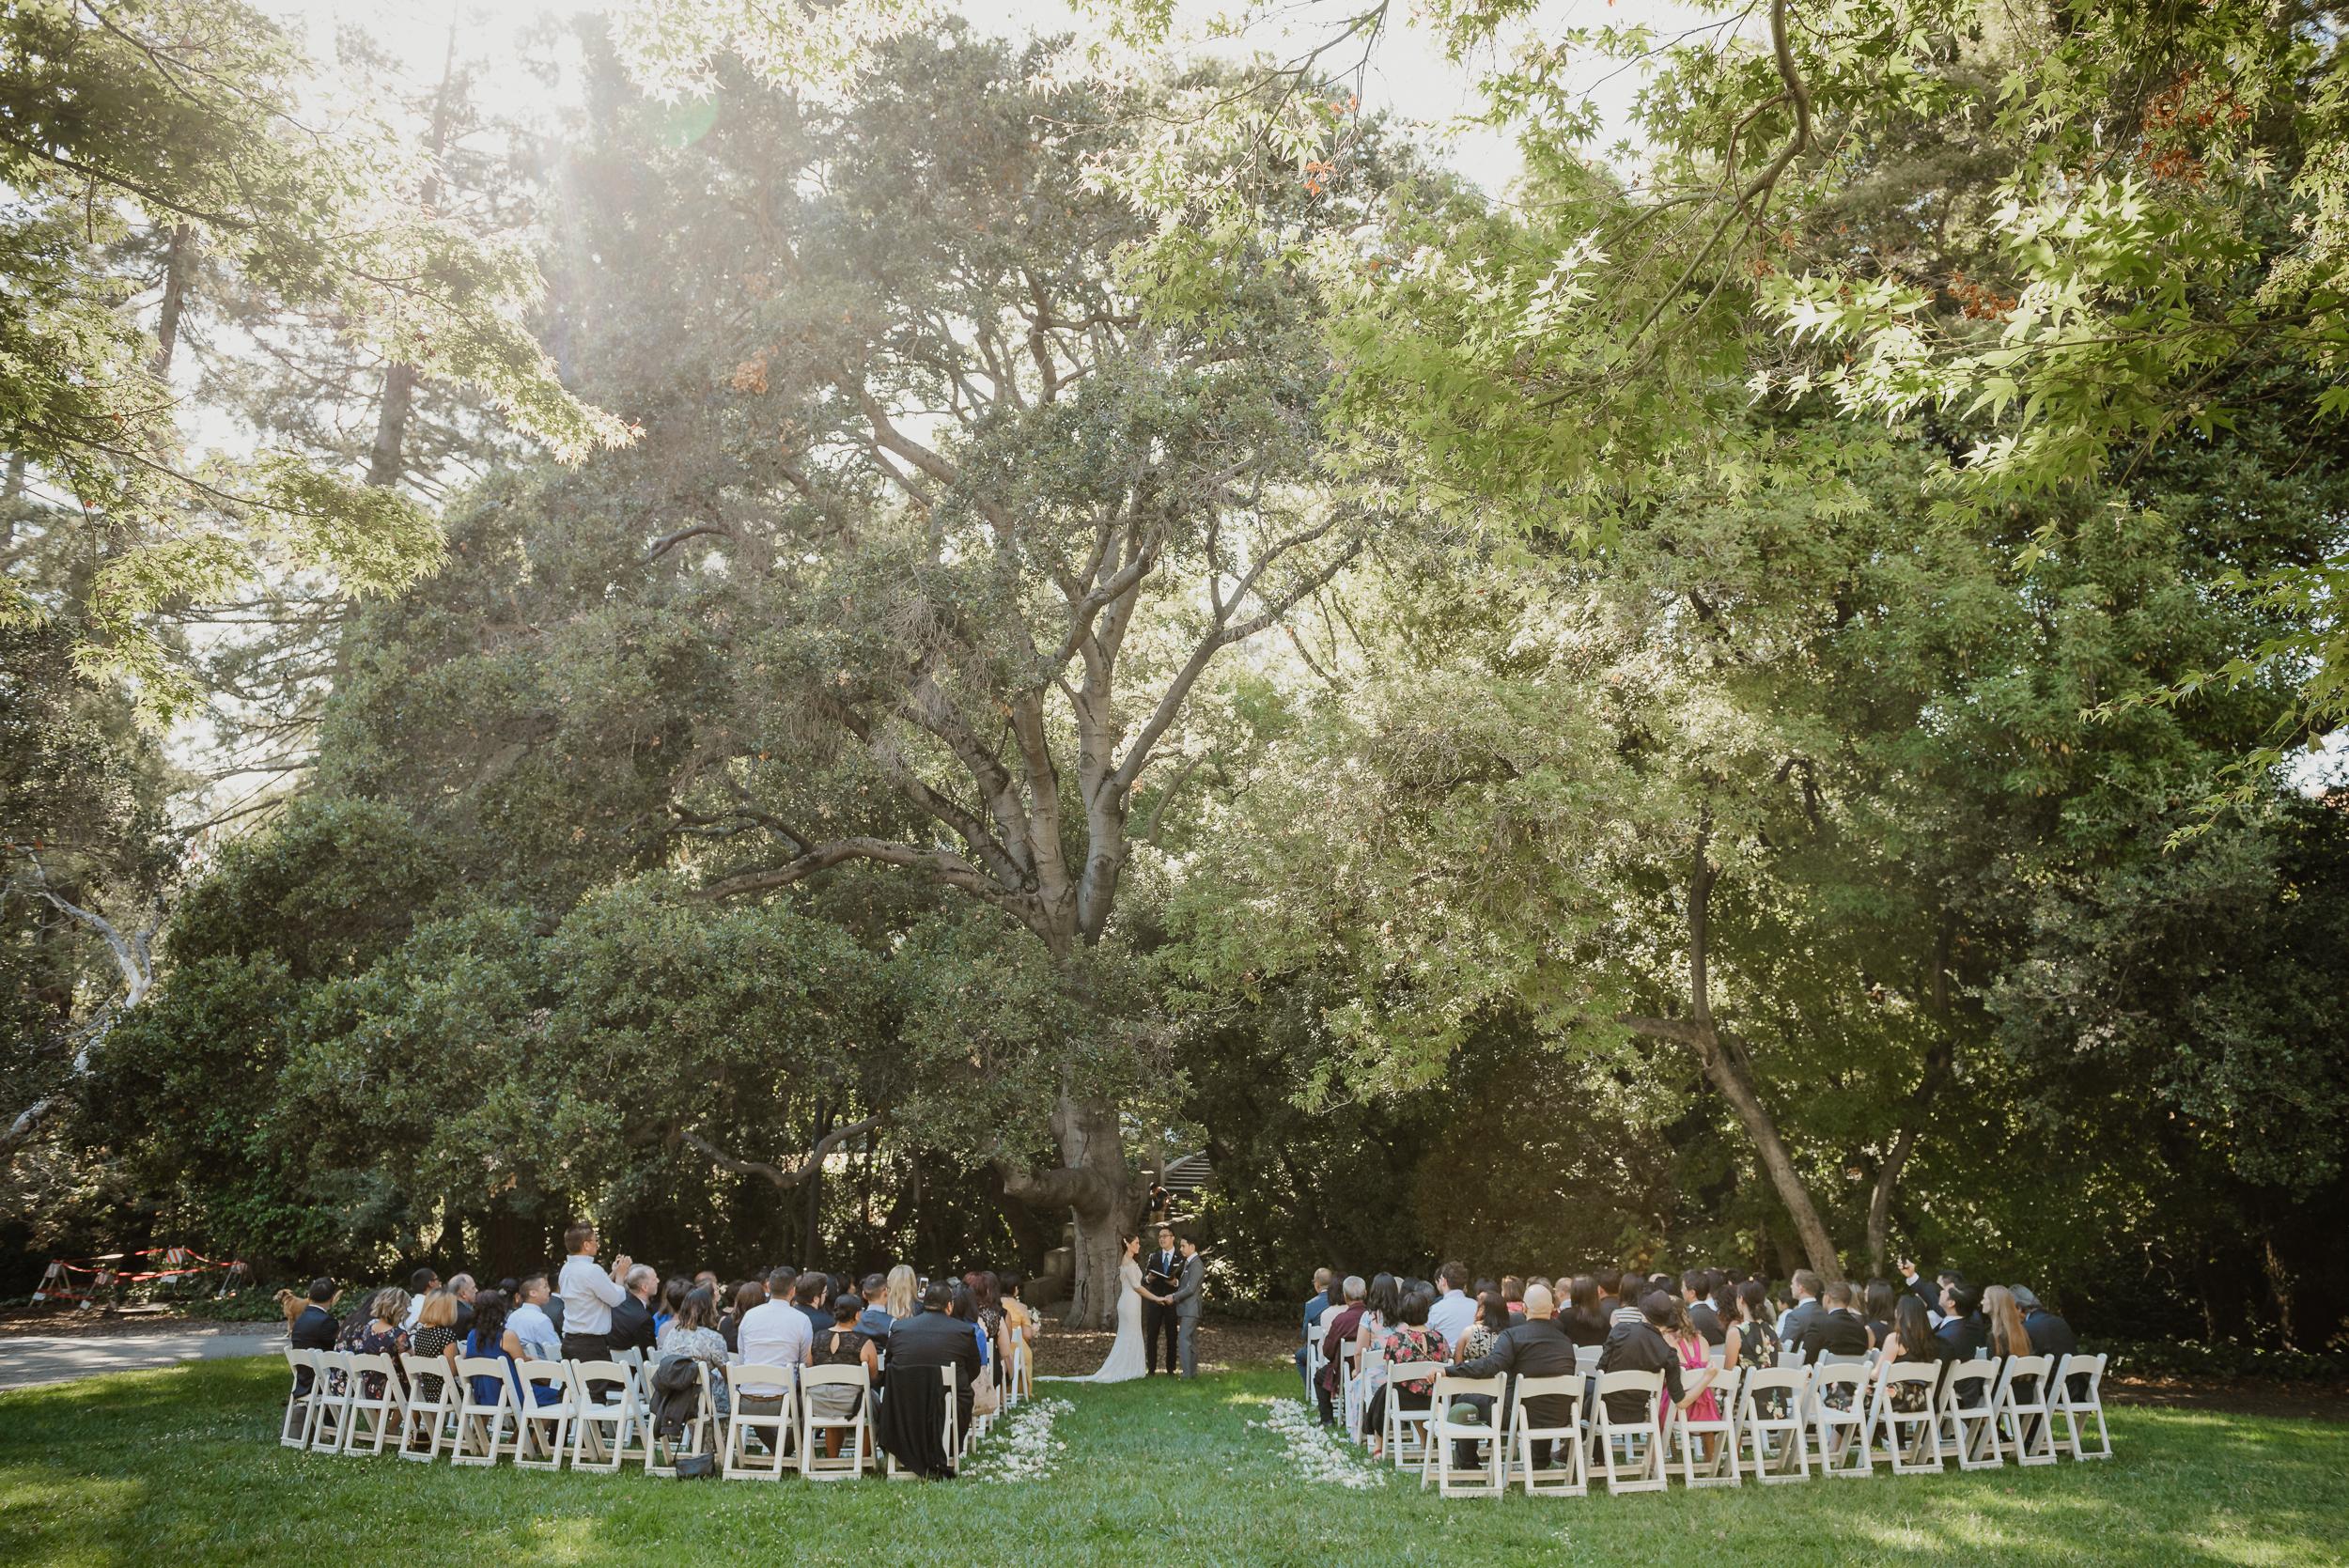 28-berkeley-uc-faculty-club-wedding-kb-vivianchen-221.jpg